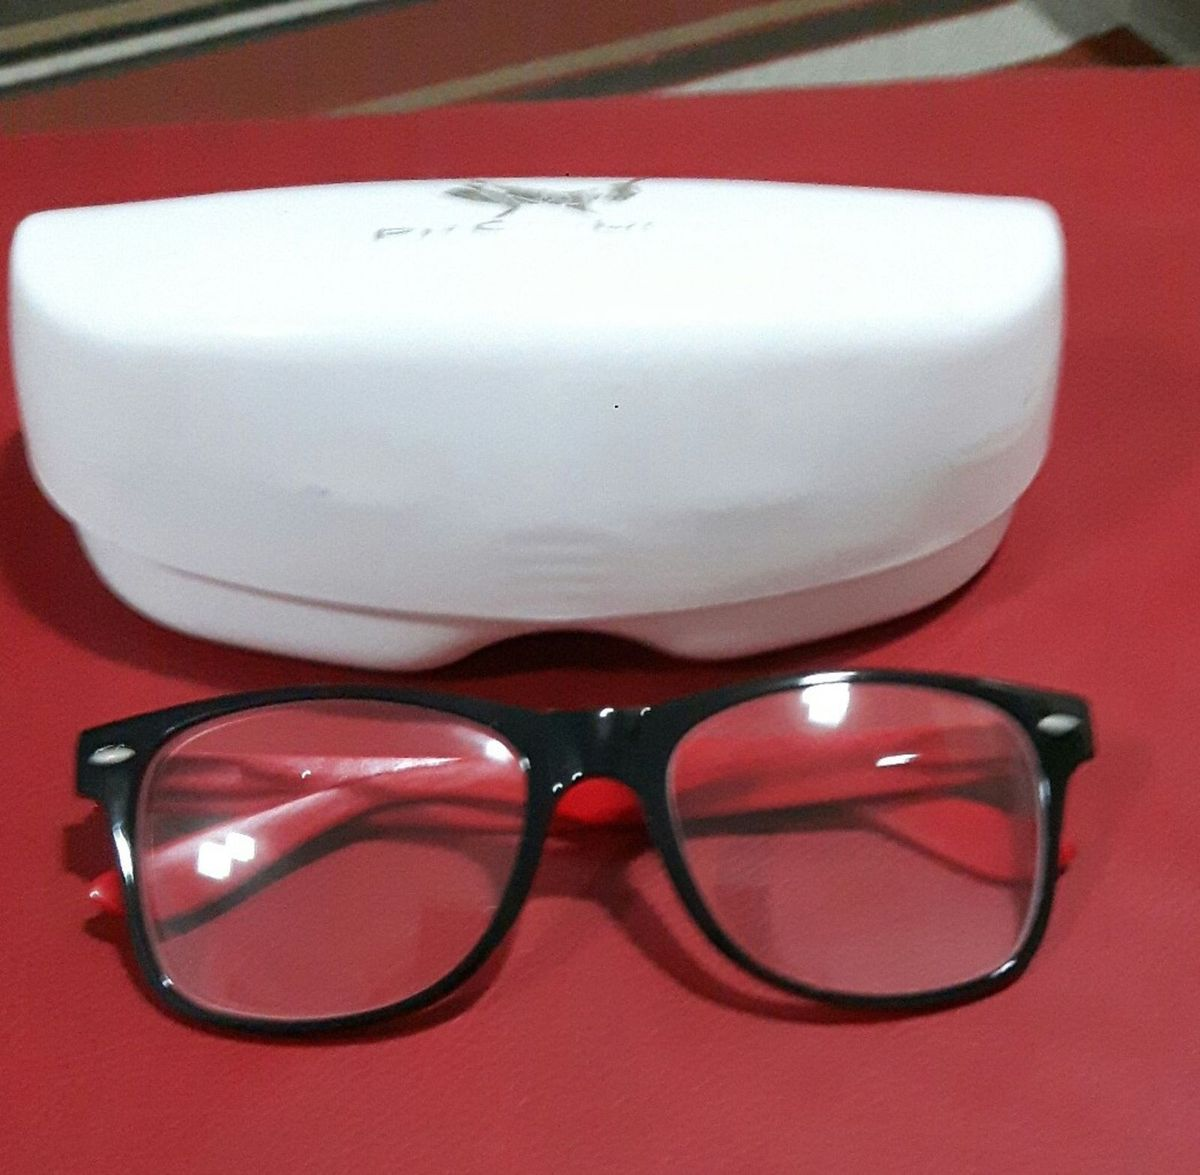 974f1d12b97d7 oculos prorider - óculos prorider.  Czm6ly9wag90b3muzw5qb2vplmnvbs5ici9wcm9kdwn0cy81mdkync9howrkmmfhmdzmywe1mdg5ztkyzgq4y2y0njk5mwe3oc5qcgc  ...